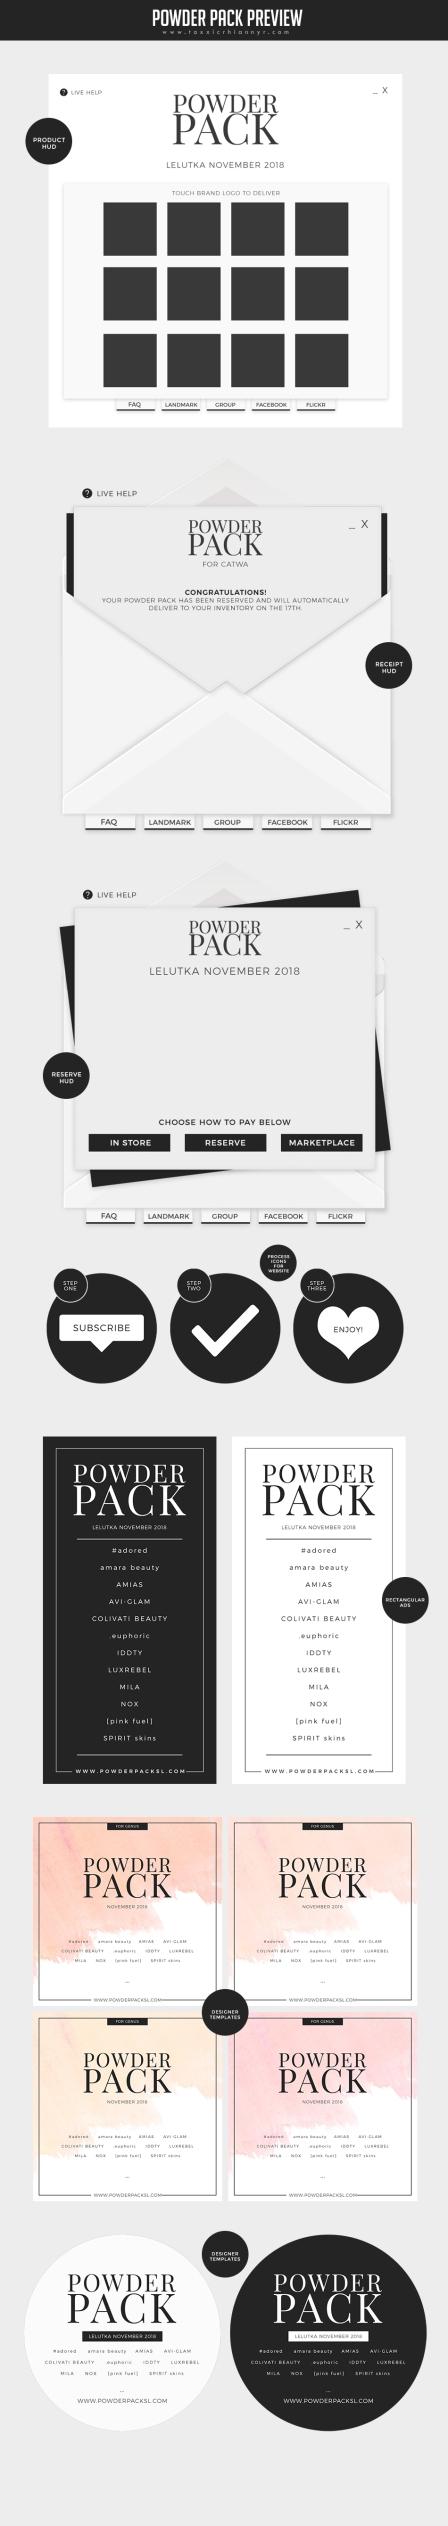 powderpack